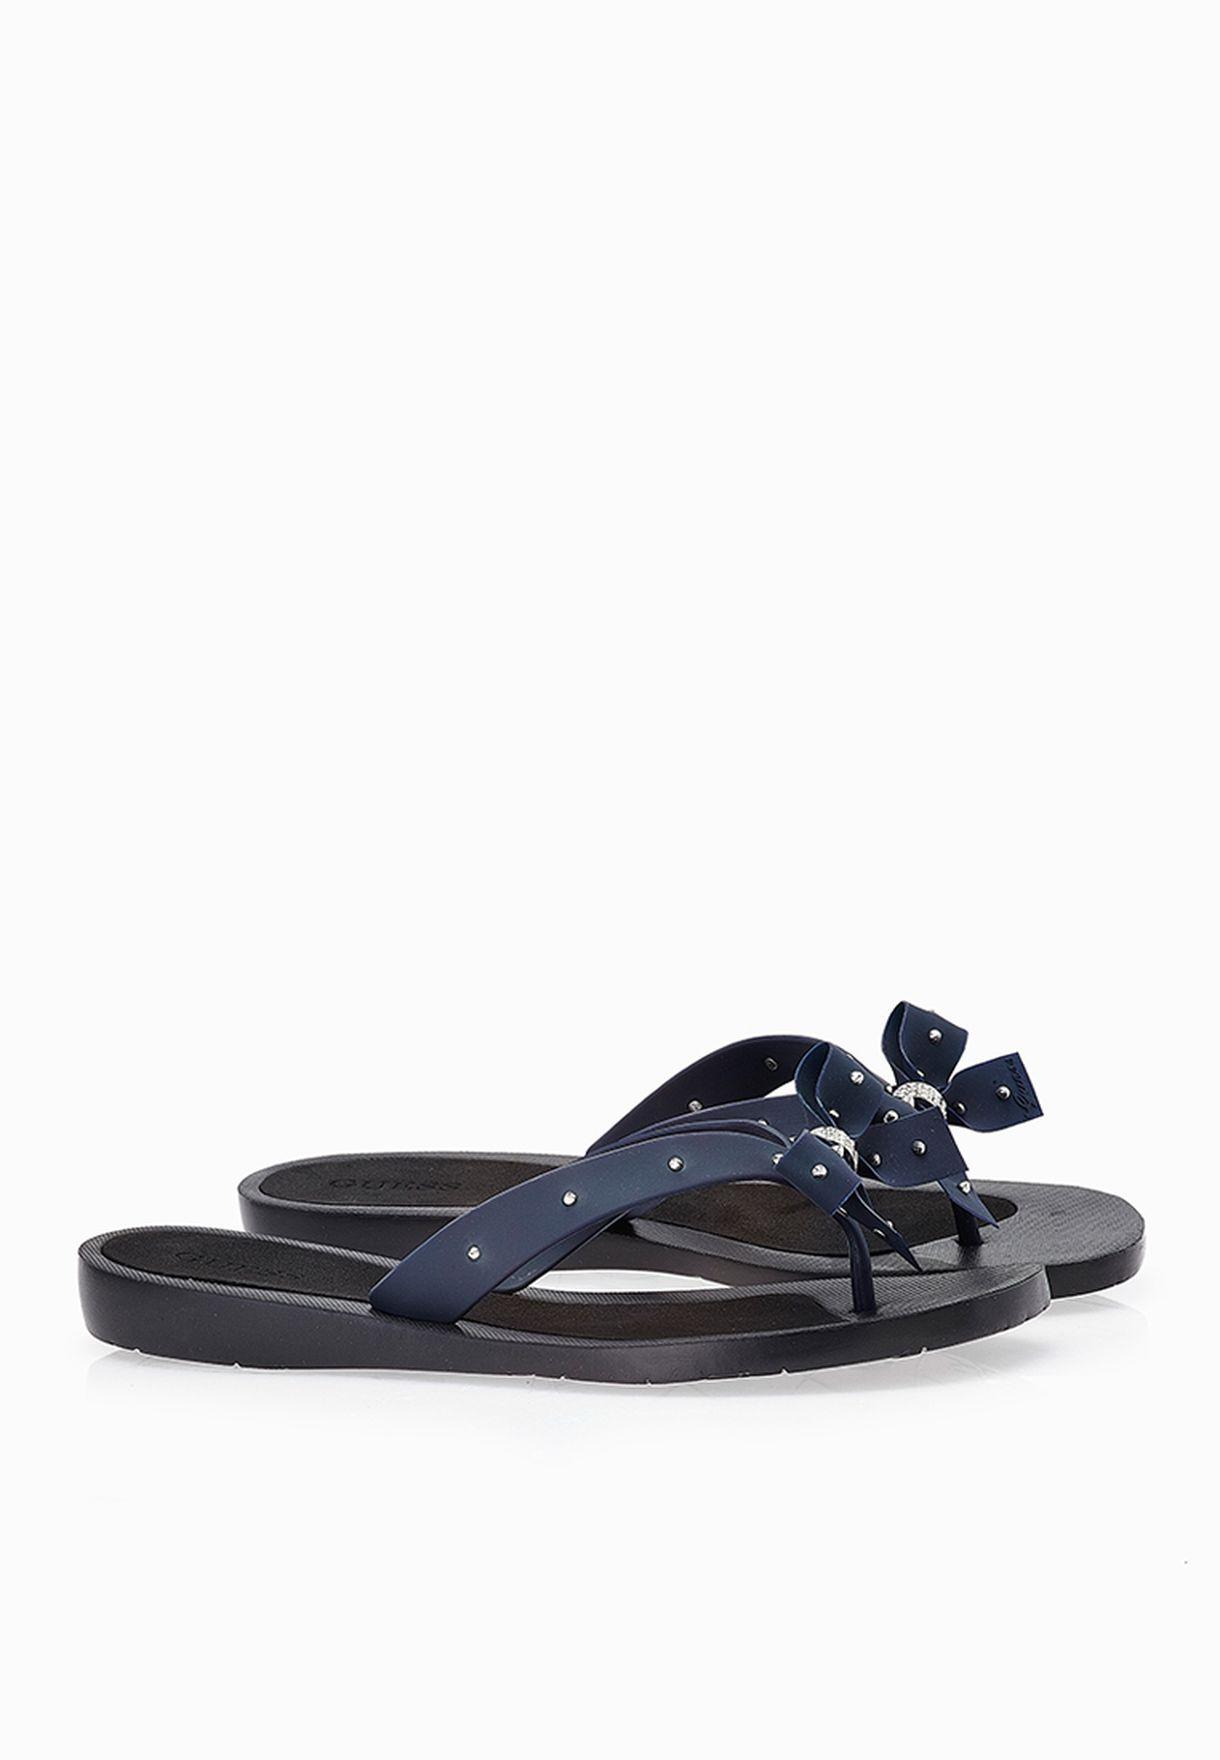 438aaf46baf6 Shop Guess blue Bow Thong Sandals gwTRIXY-B for Women in UAE ...